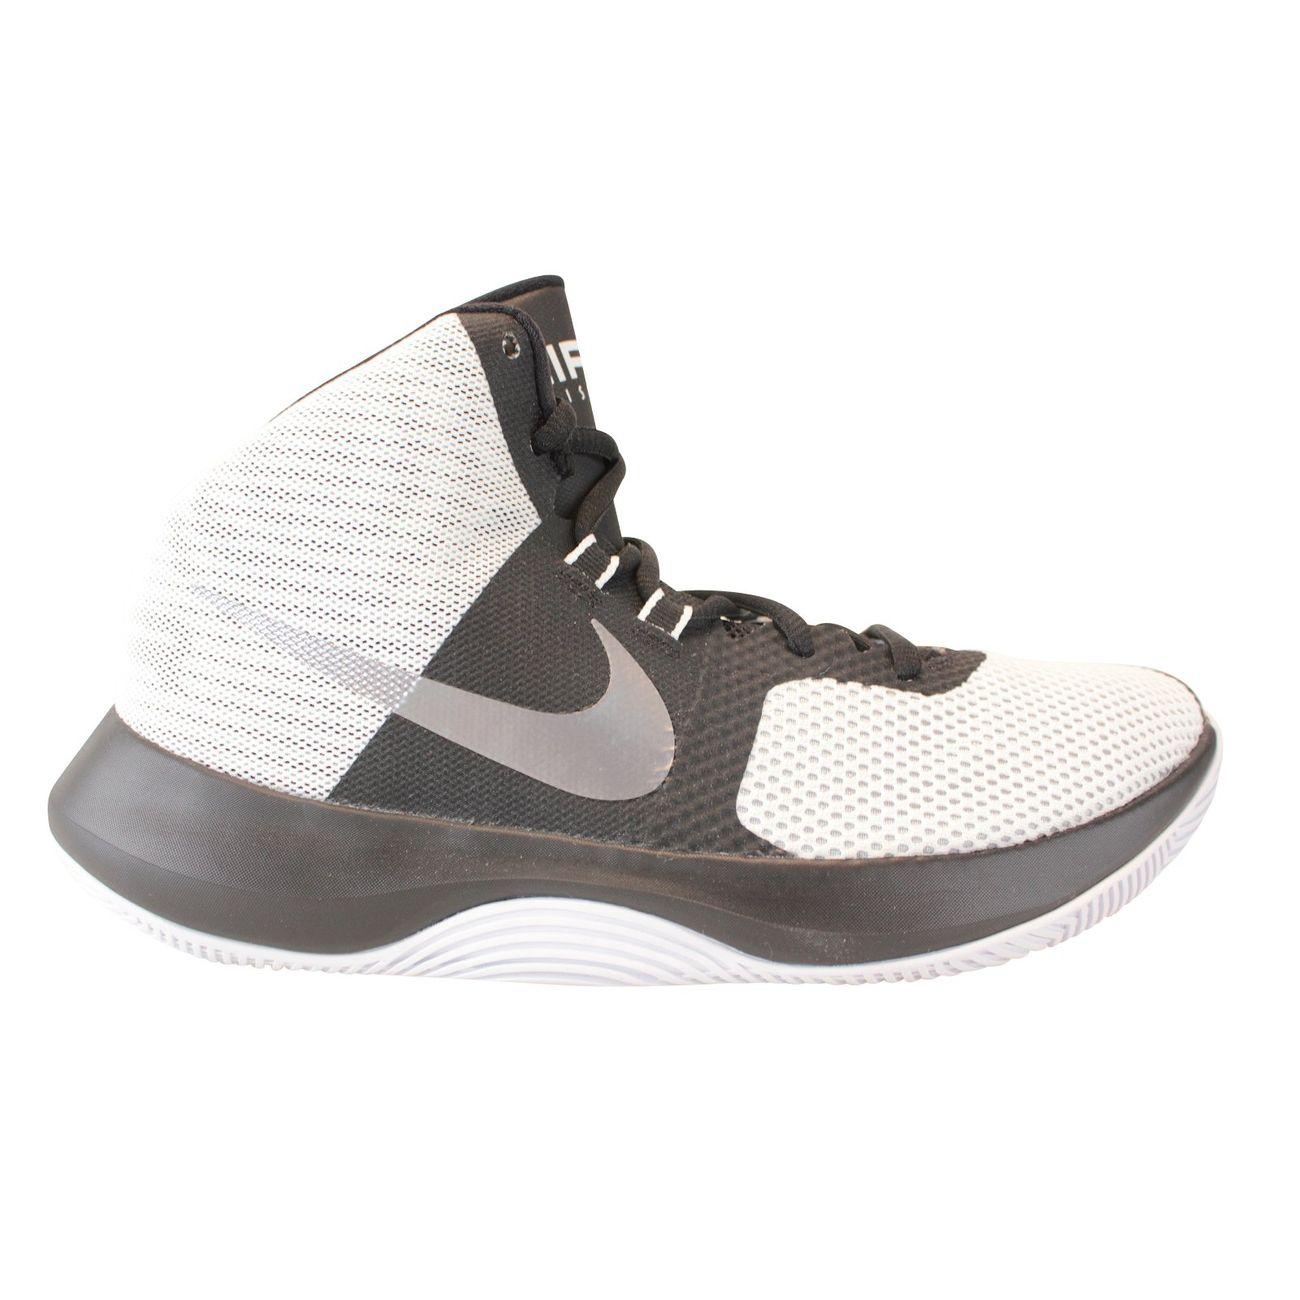 Precision Nike Pas Air Et Achat CherGo Prix – Sport 898455 102 RjLc3A54q